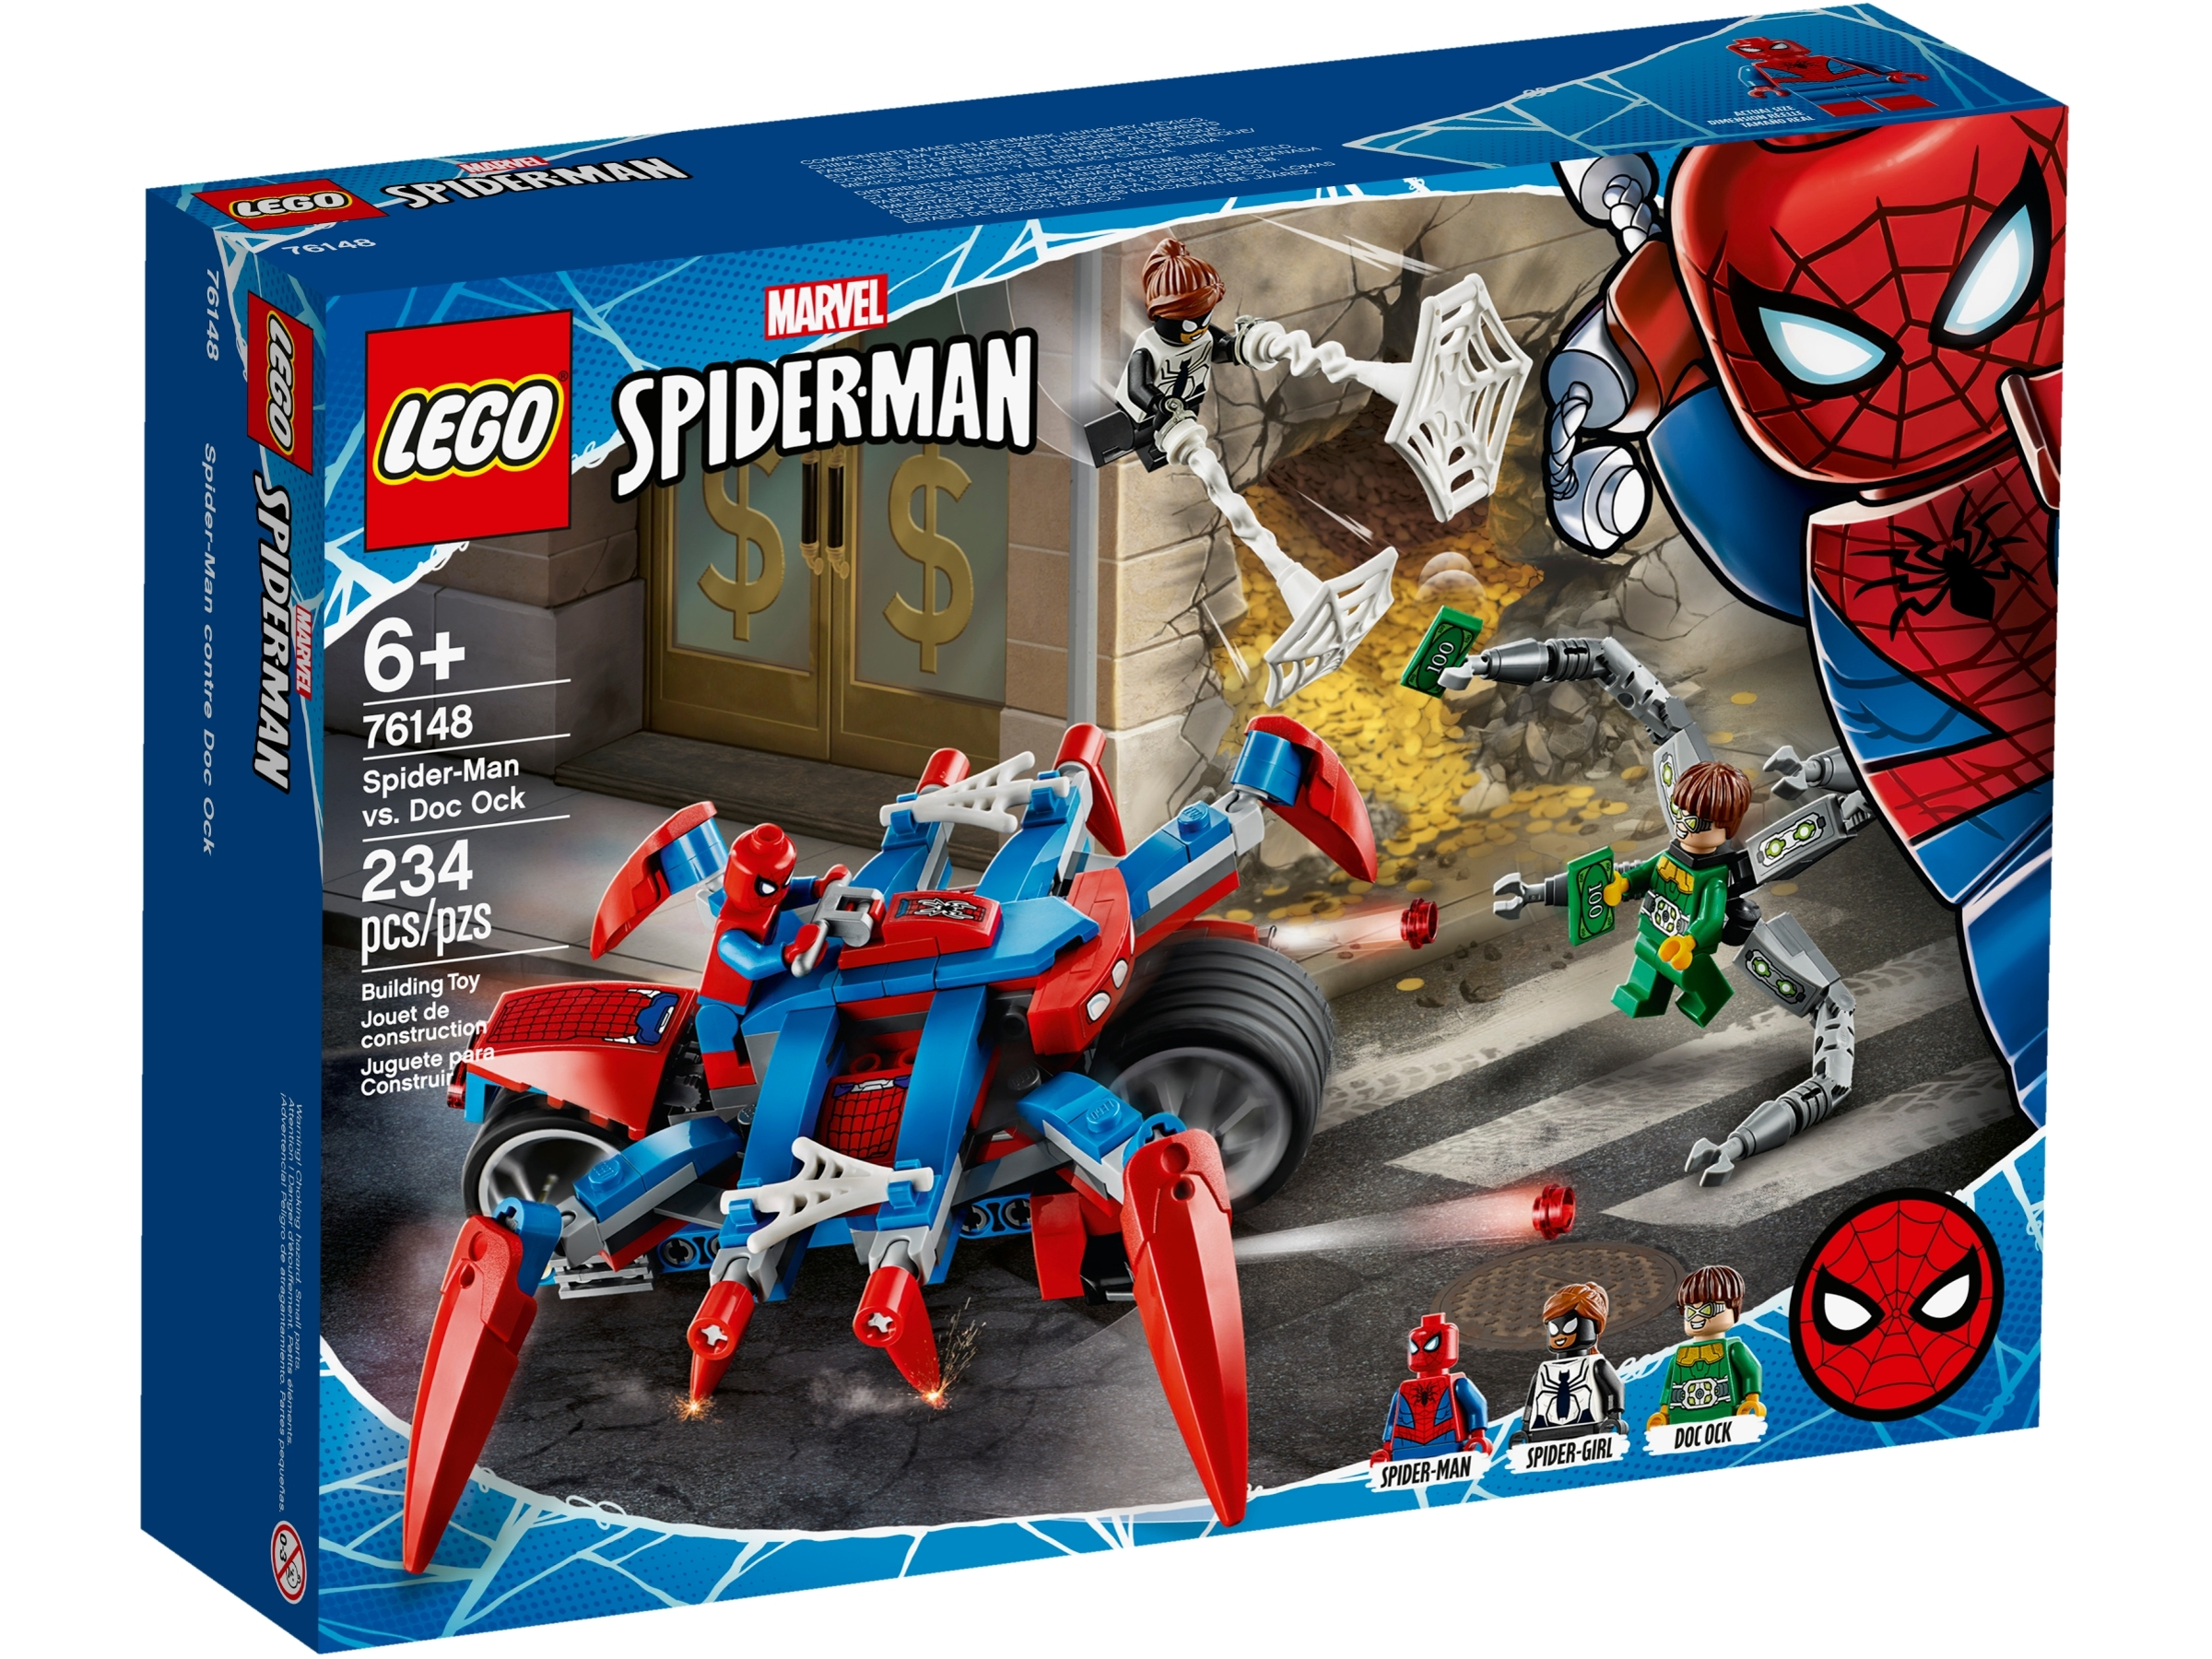 lego 76148 spider man kontra doc ock